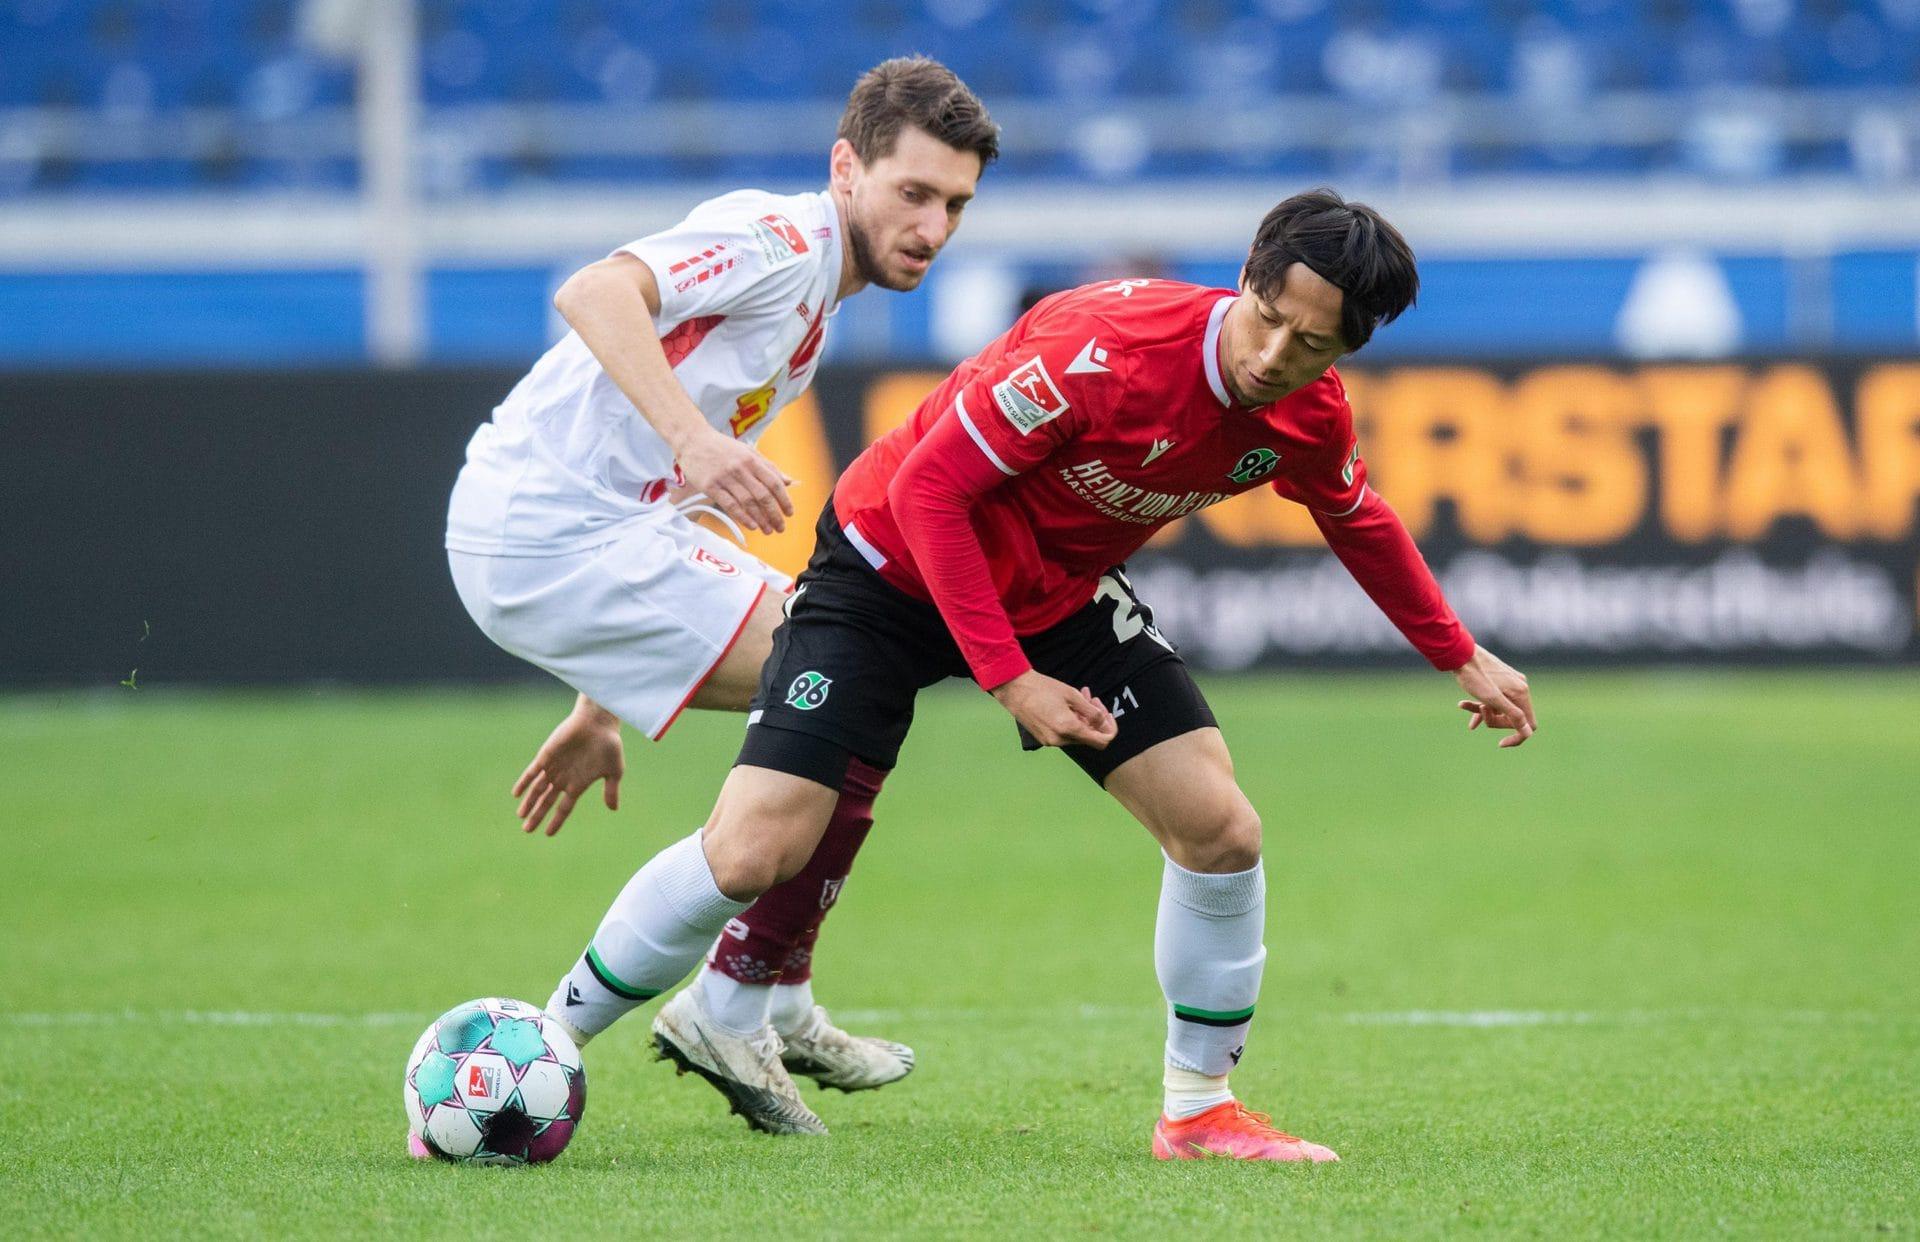 Jahn Regensburg nach 1:3 in Hannover im Tabellenkeller 2. Bundesliga